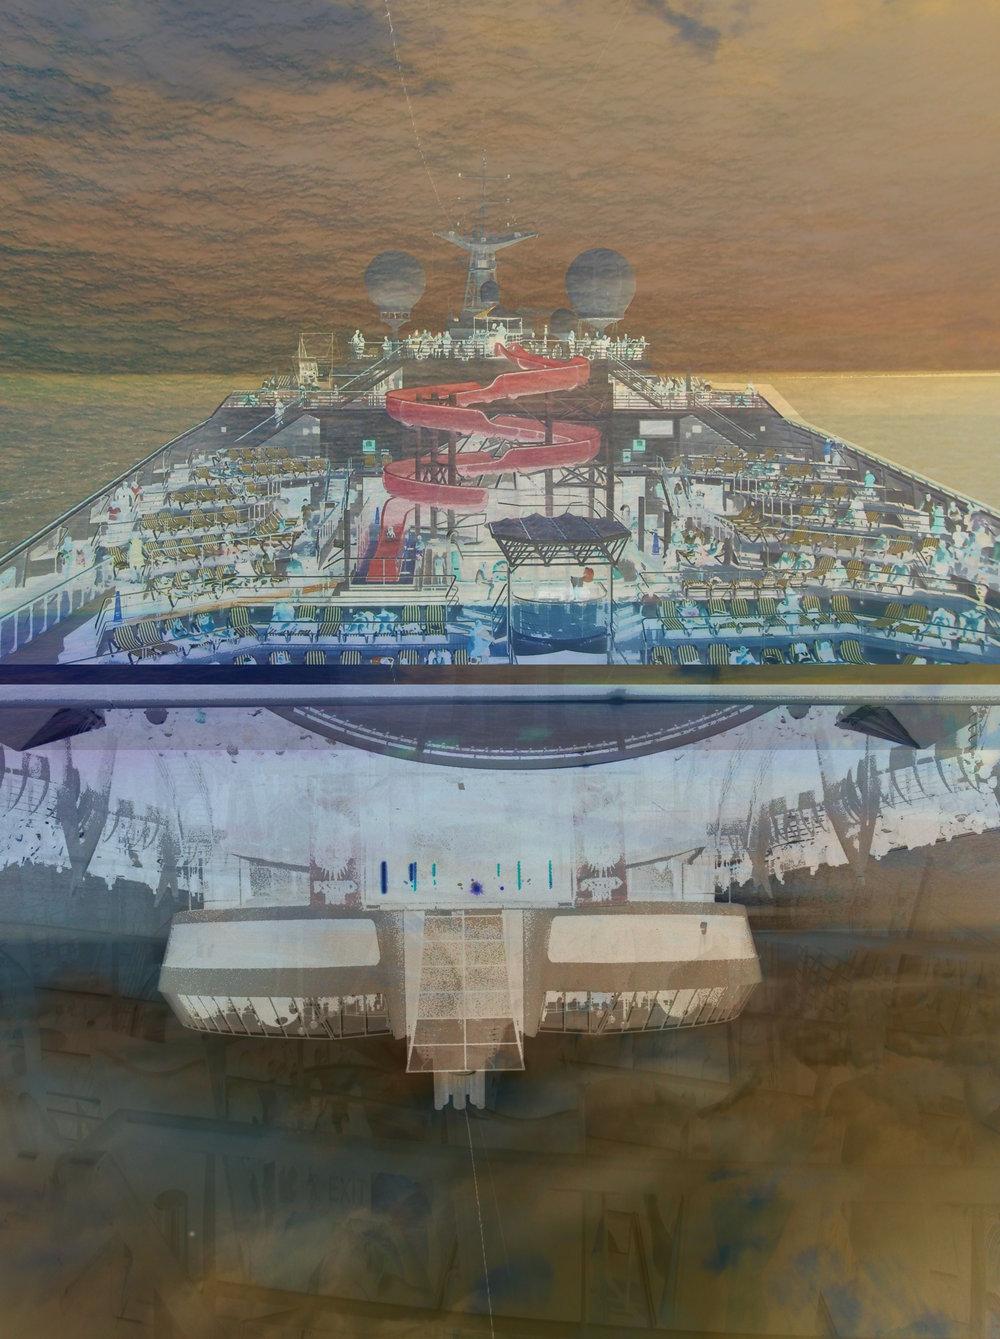 jamcruise-dba-cloud-nine-adventures-cruise-ship-festival-harassment.jpg